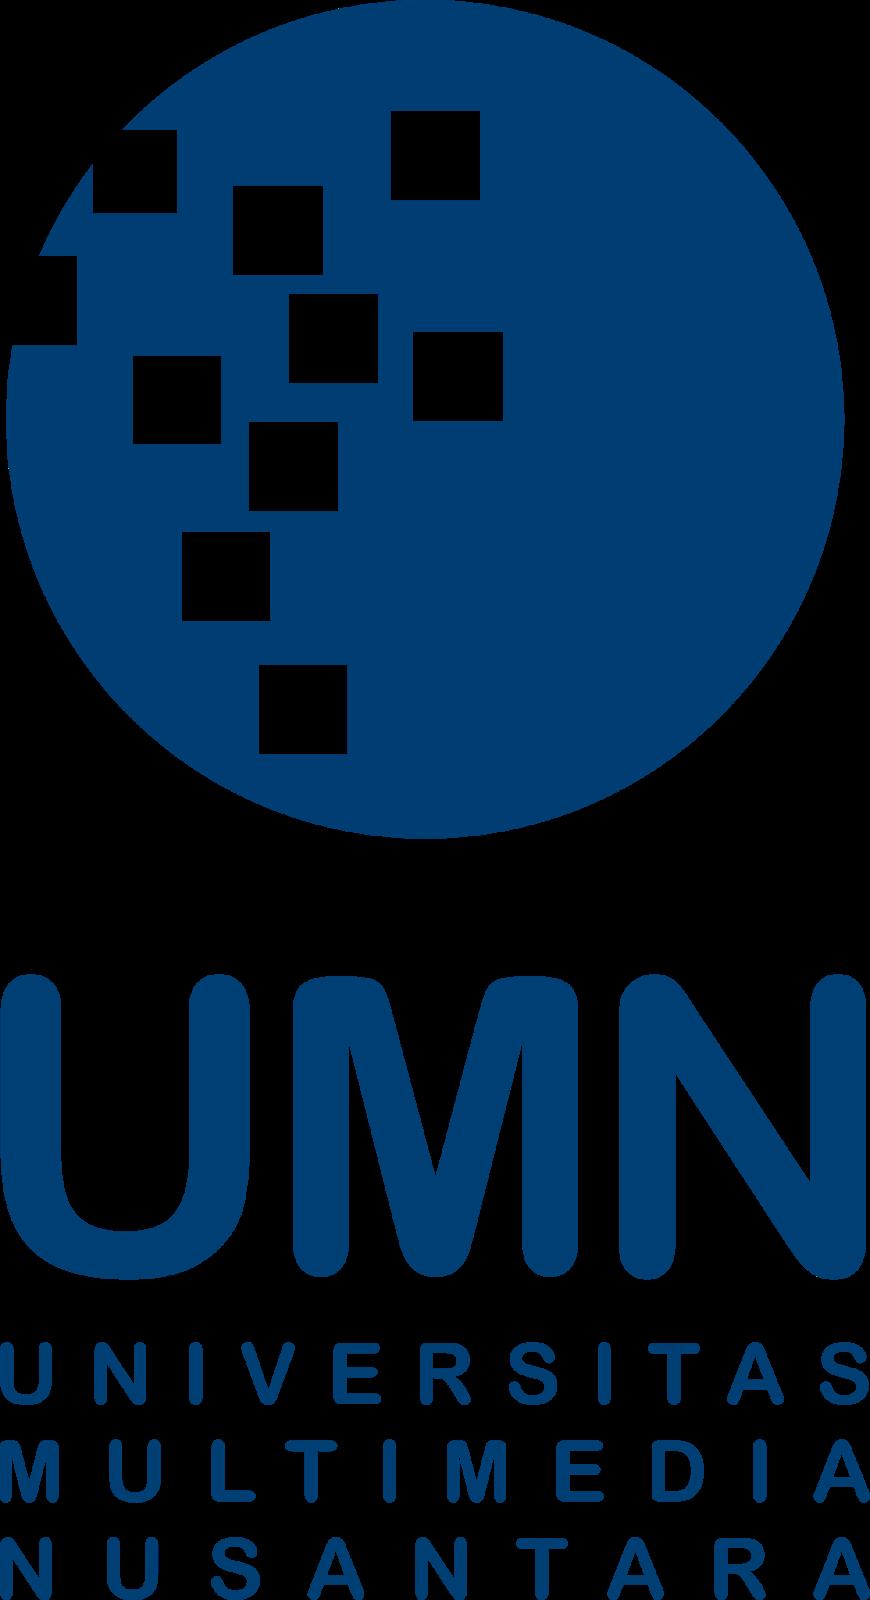 Universitas Multimedia Nusantara (UMN) Logo | Logos Rates